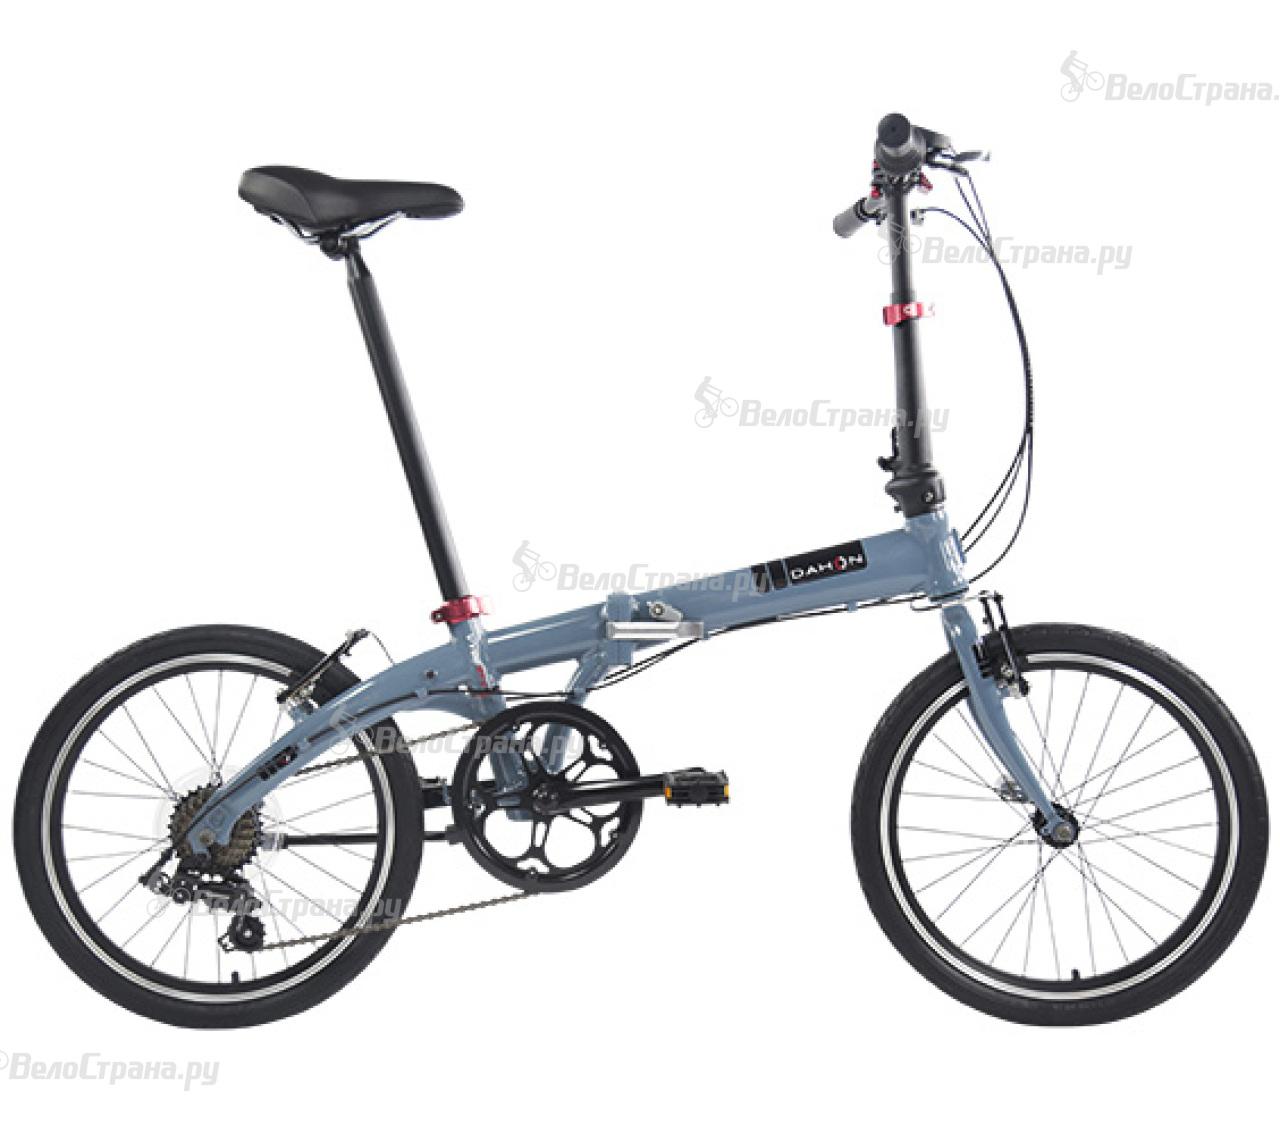 Велосипед Dahon Vybe D7 U (2017) велосипед dahon speed d7 2014